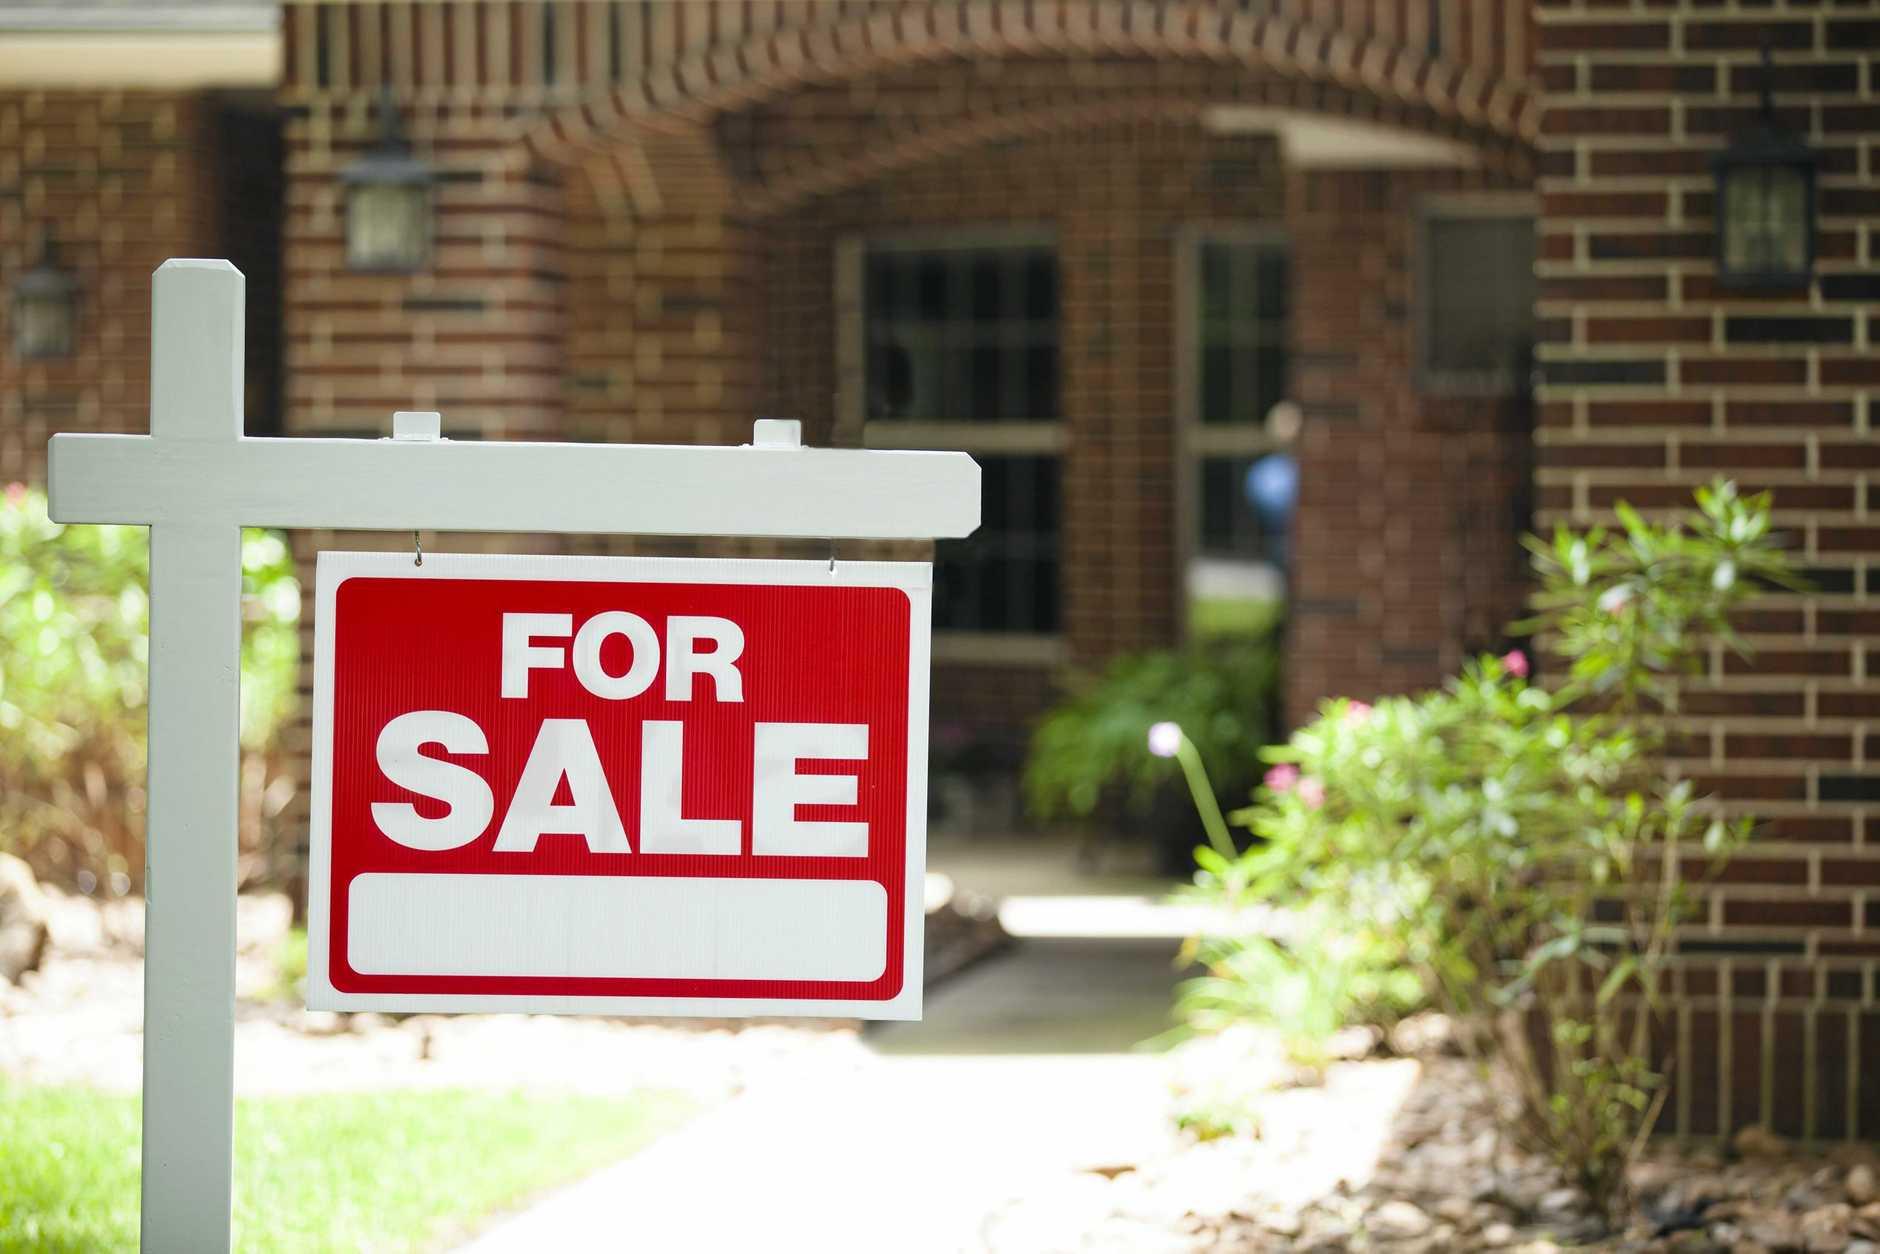 CQ REAL ESTATE: Comparison of the Rockhampton, Mackay and Gladstone housing markets.